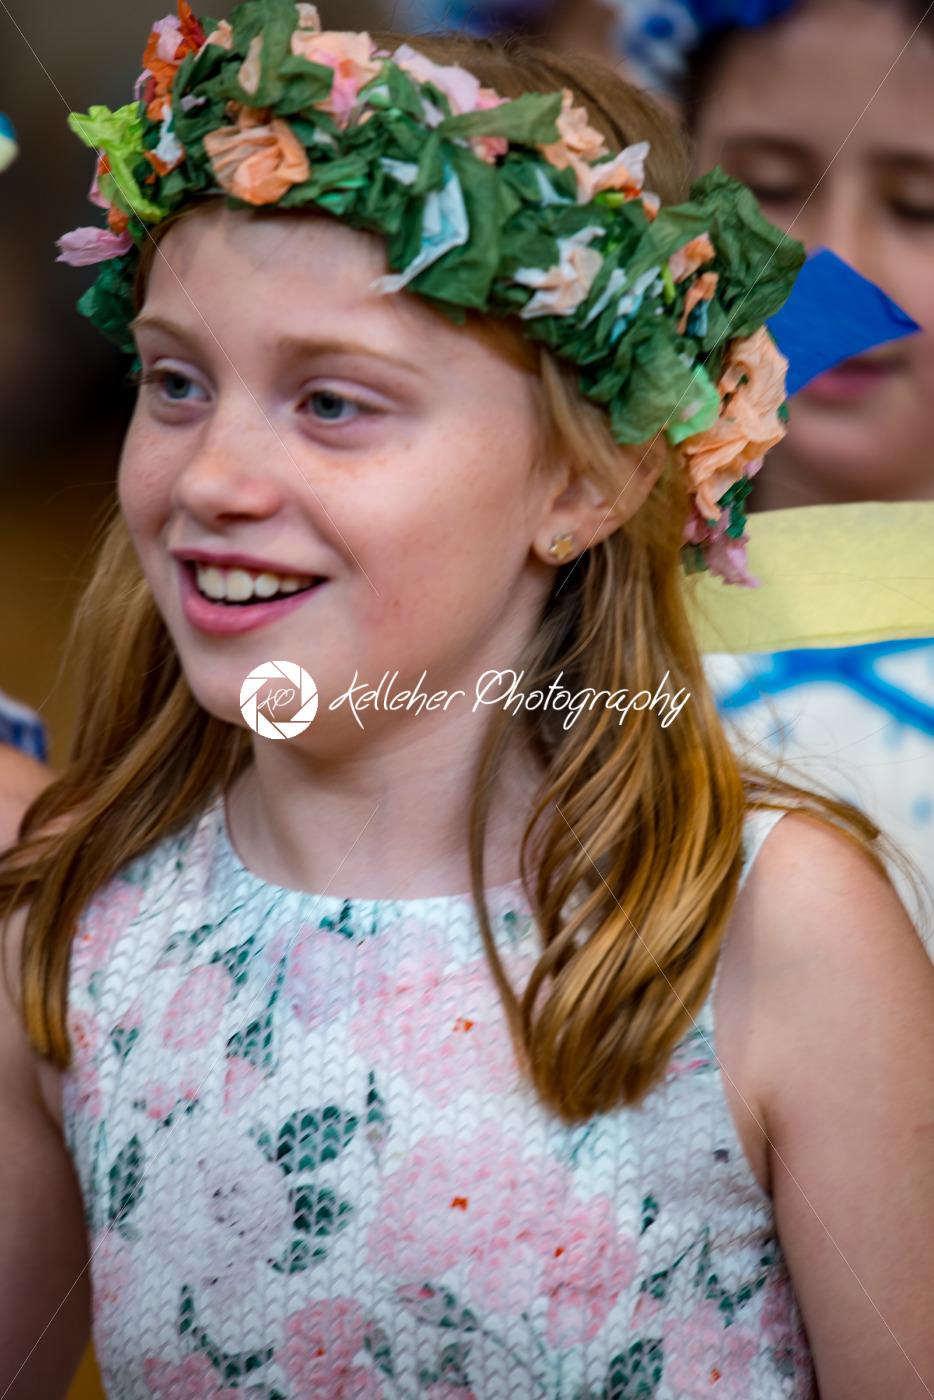 Rosemont, PA – May 18, 2018: AIS Mayfair Dances - Kelleher Photography Store